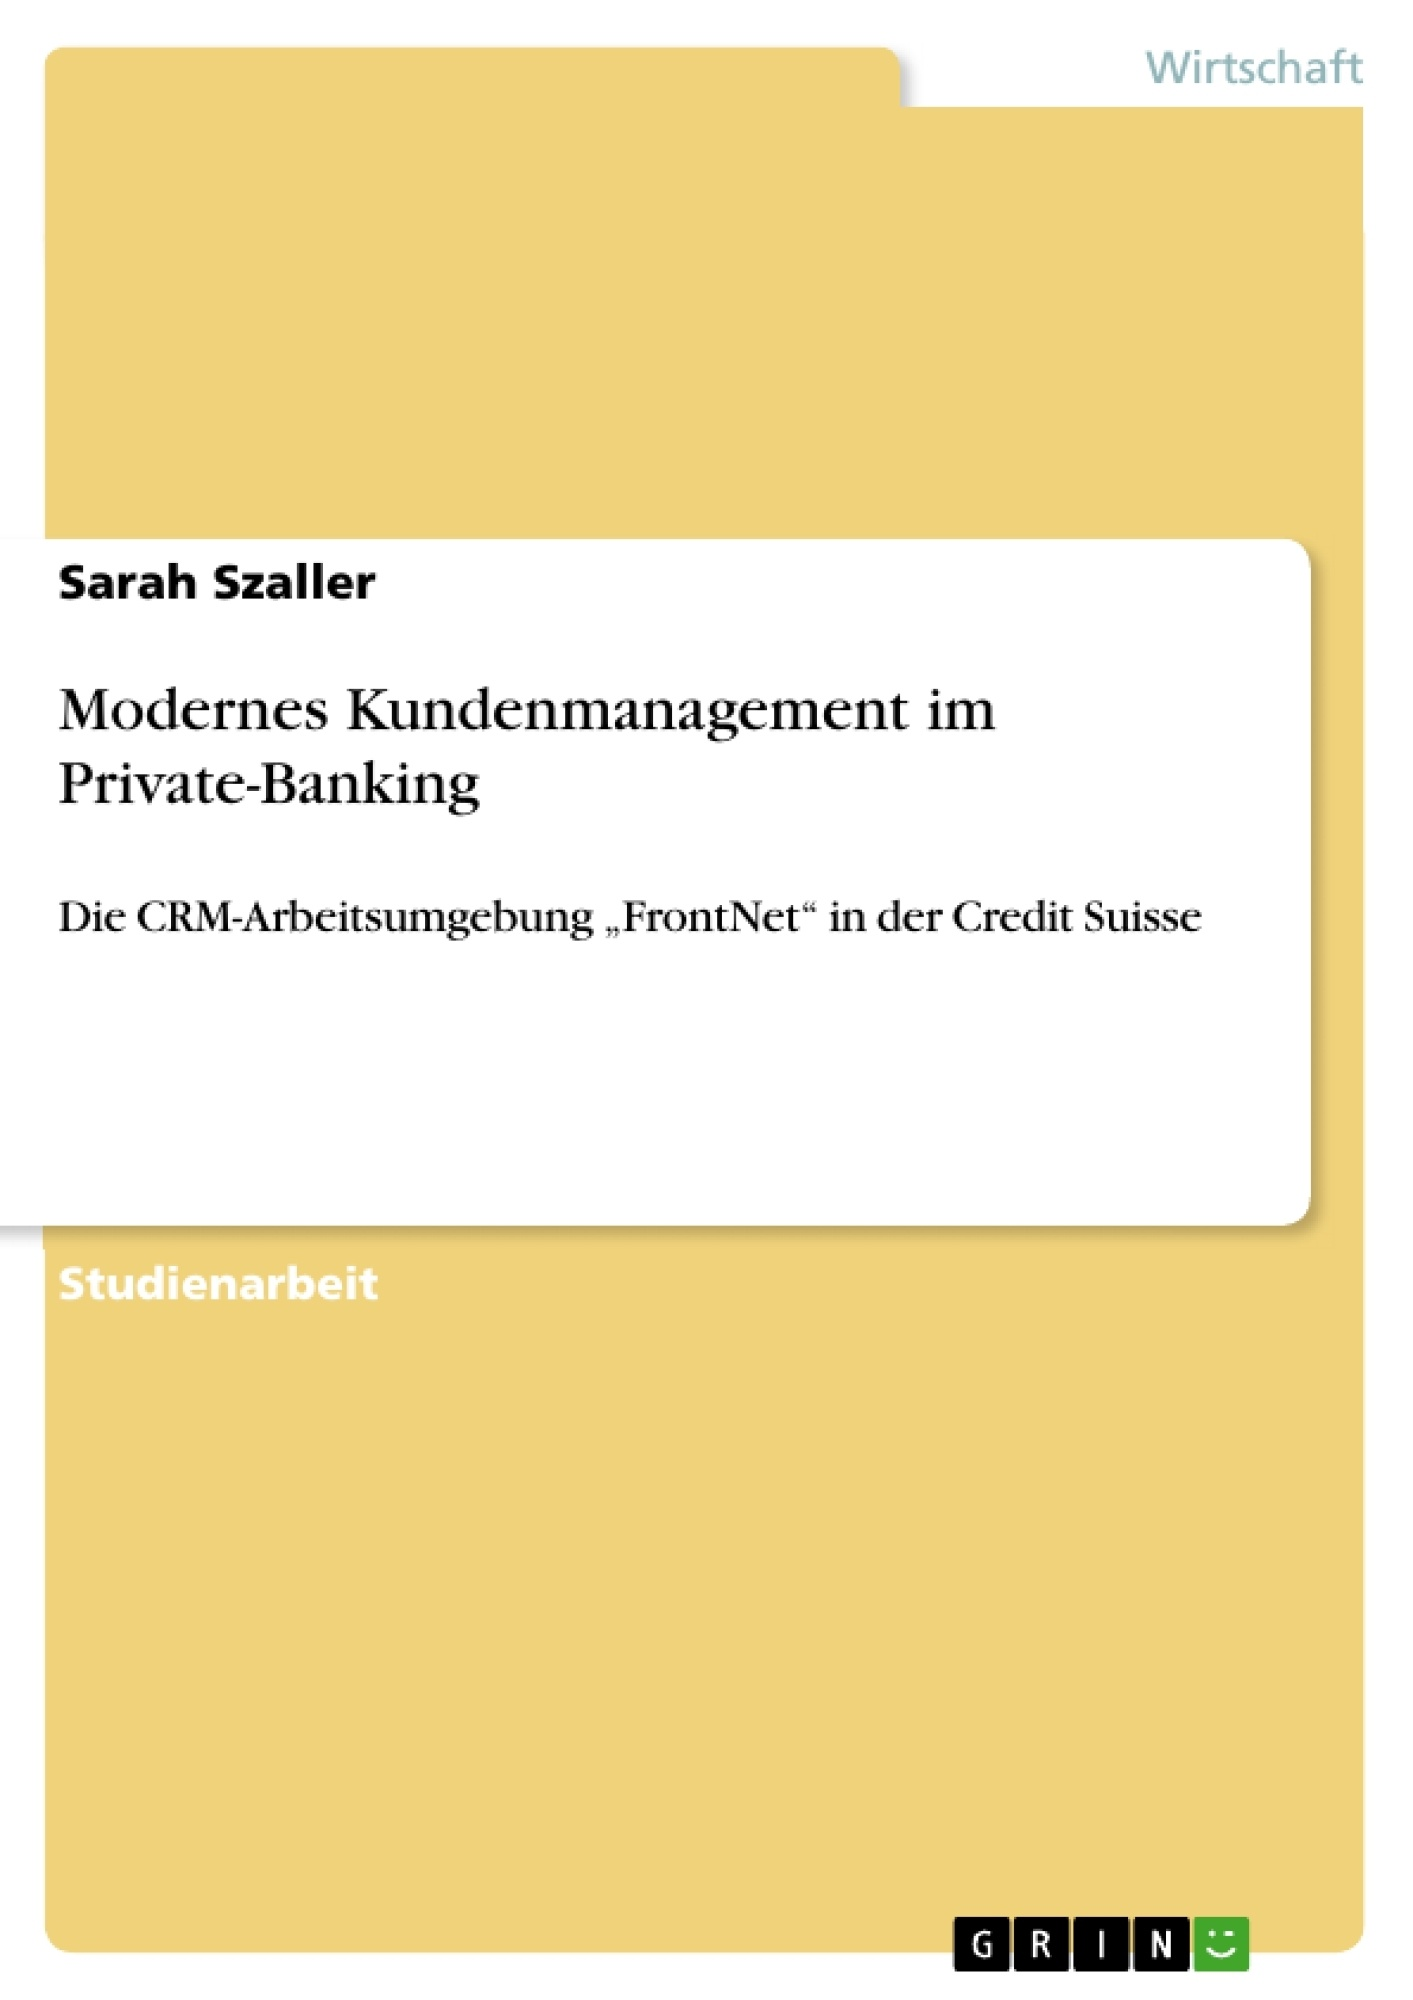 Titel: Modernes Kundenmanagement im Private-Banking